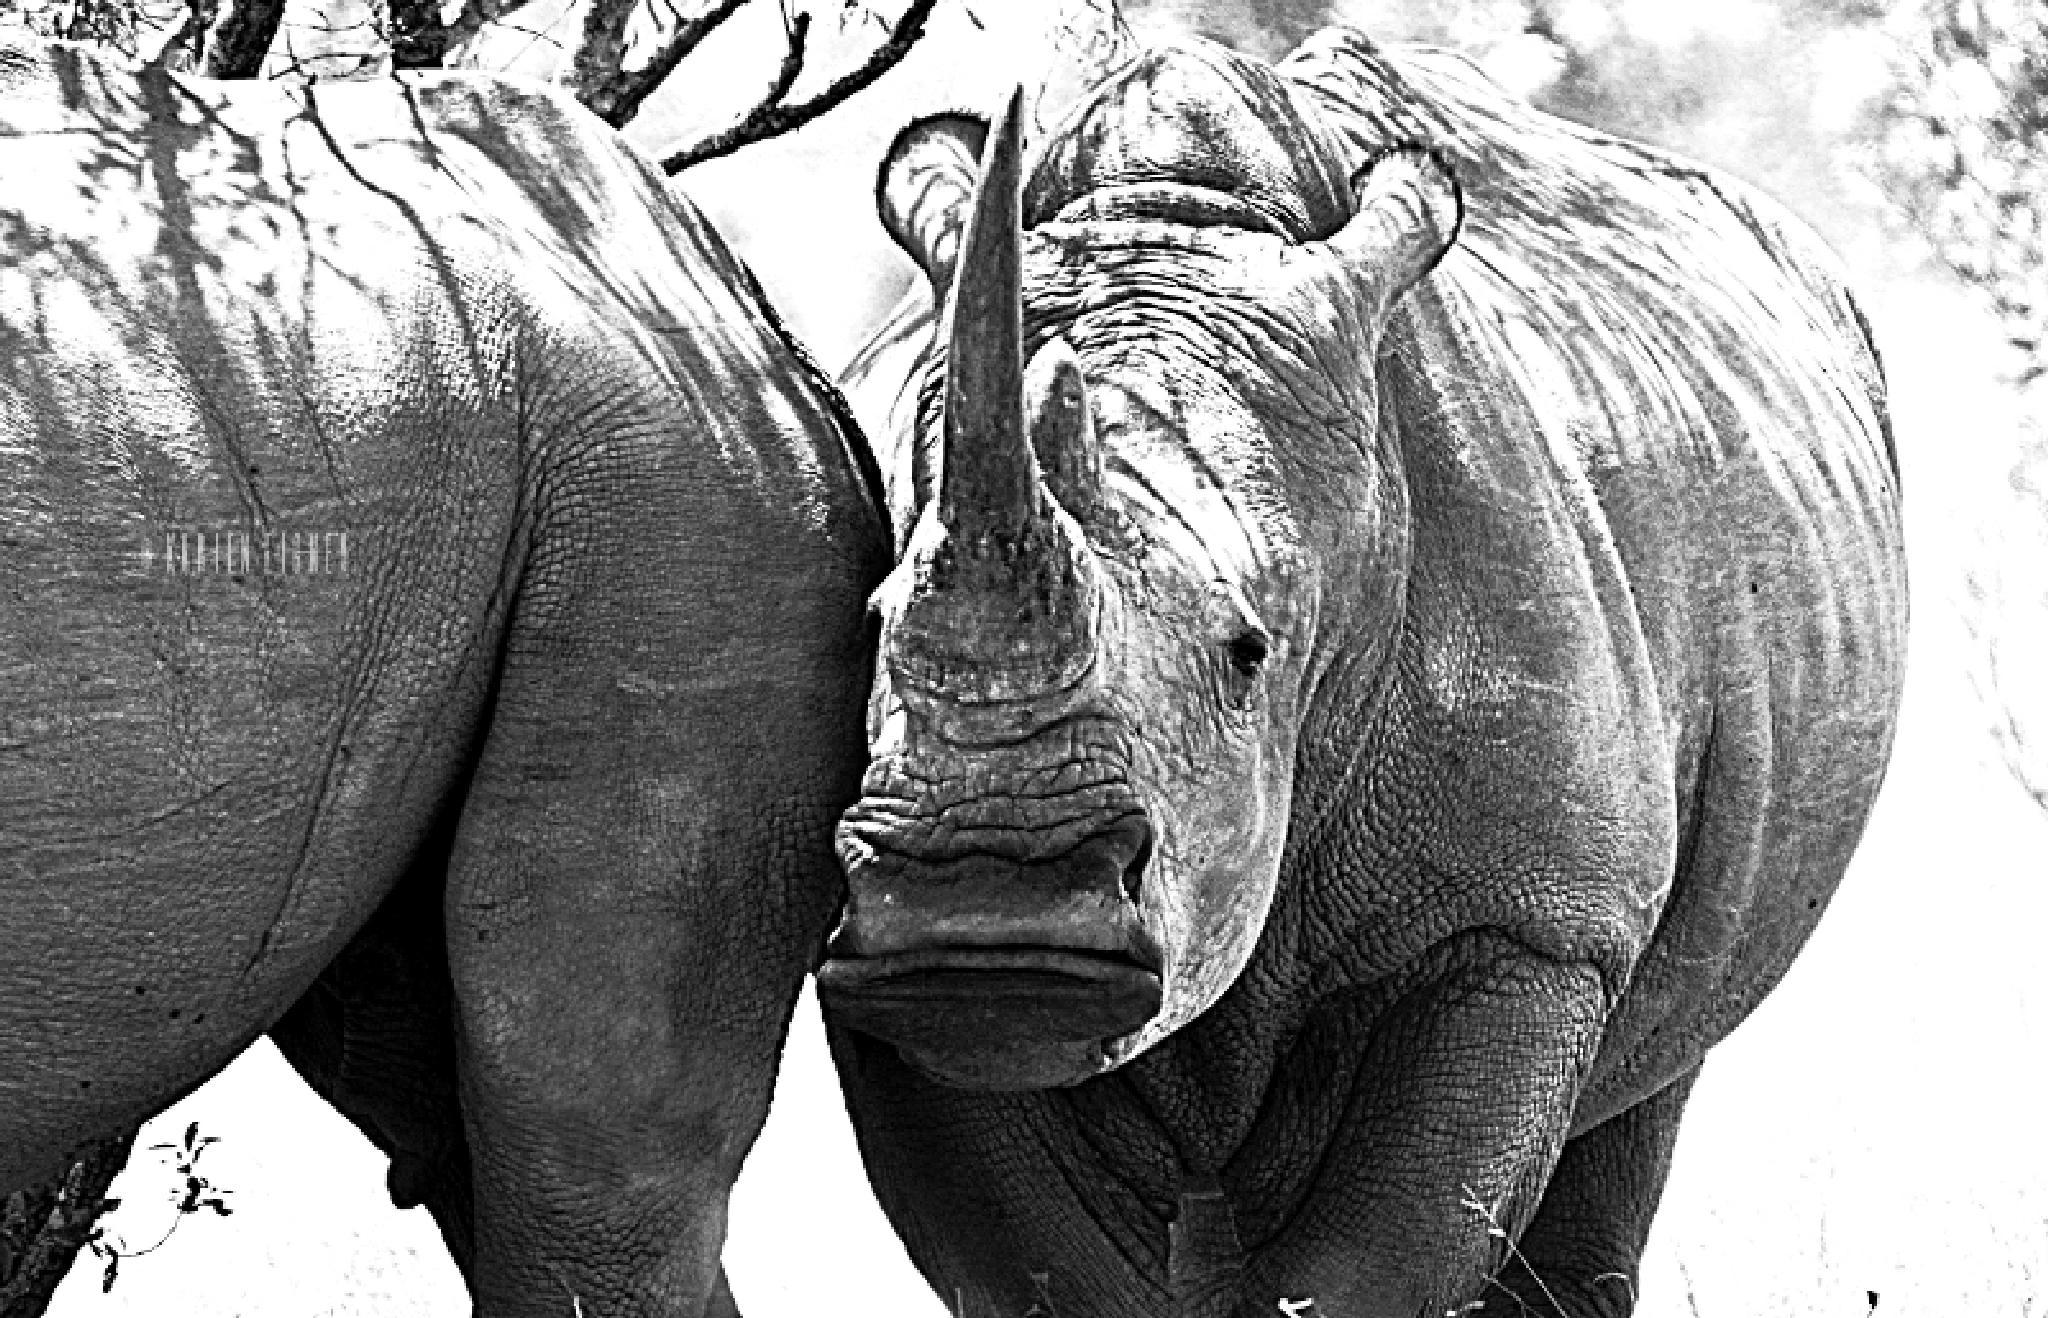 The magnificent white rhino by Karien Eigner